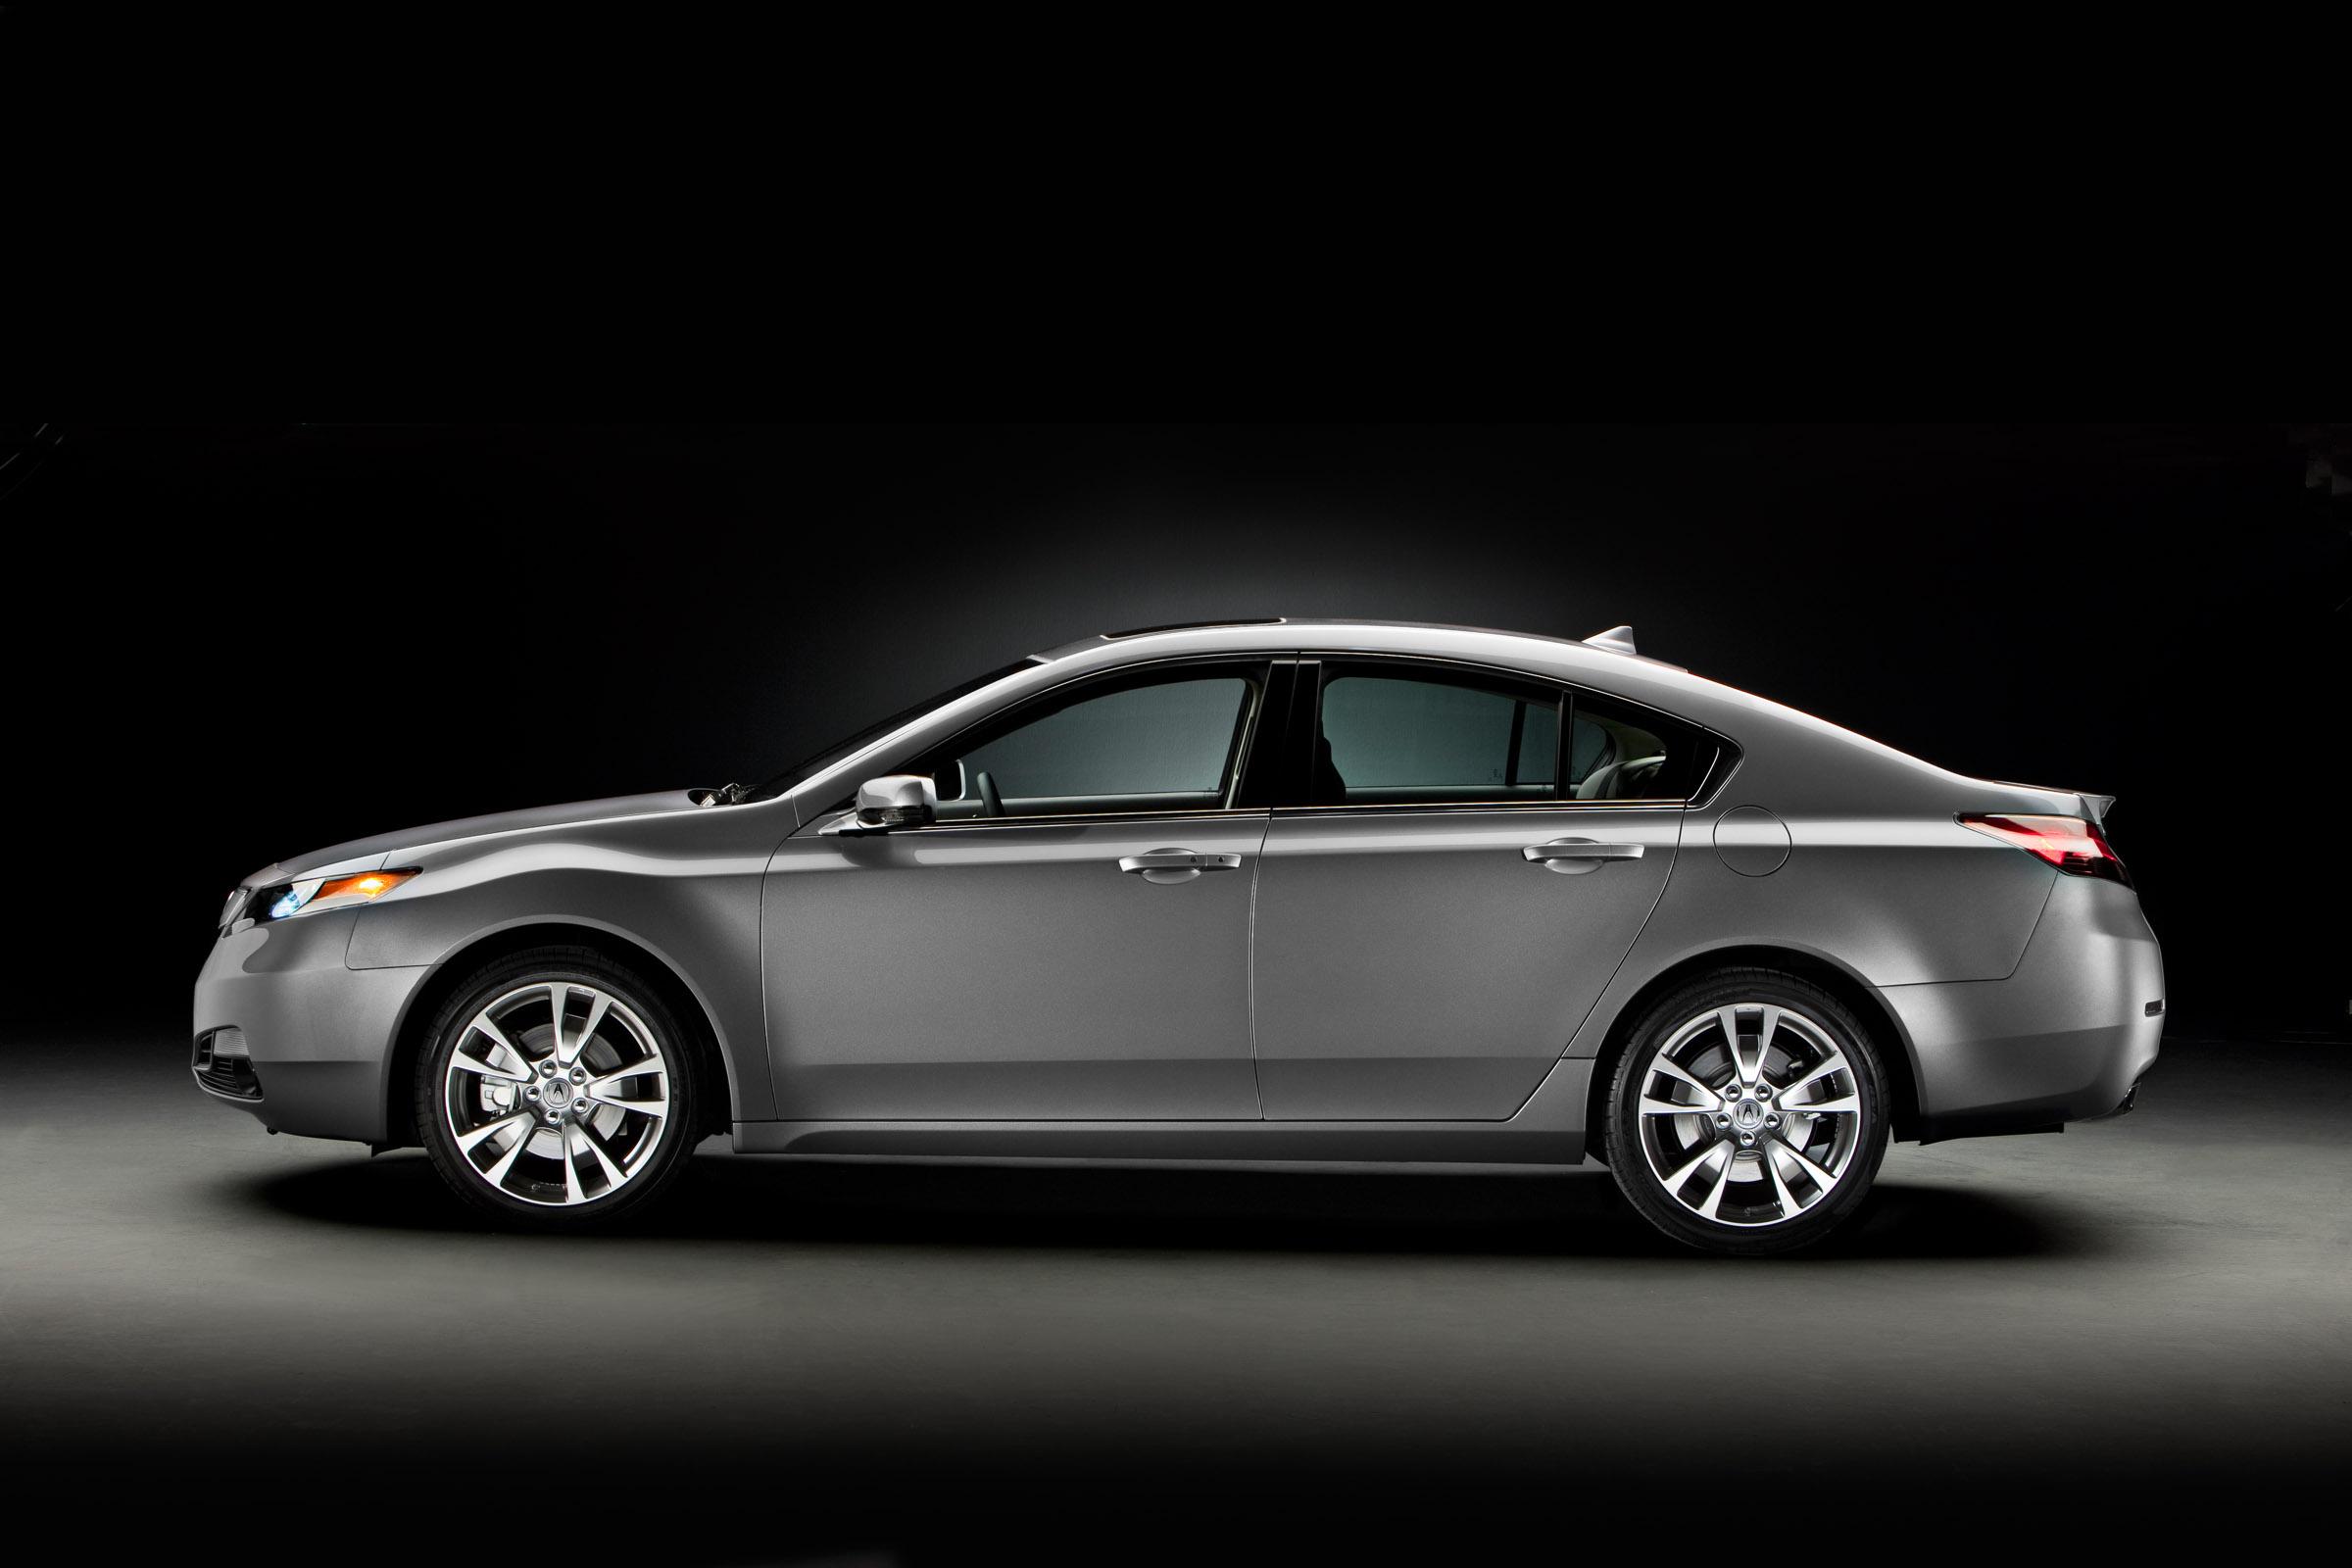 2012 Acura TL в продаже - фотография №2